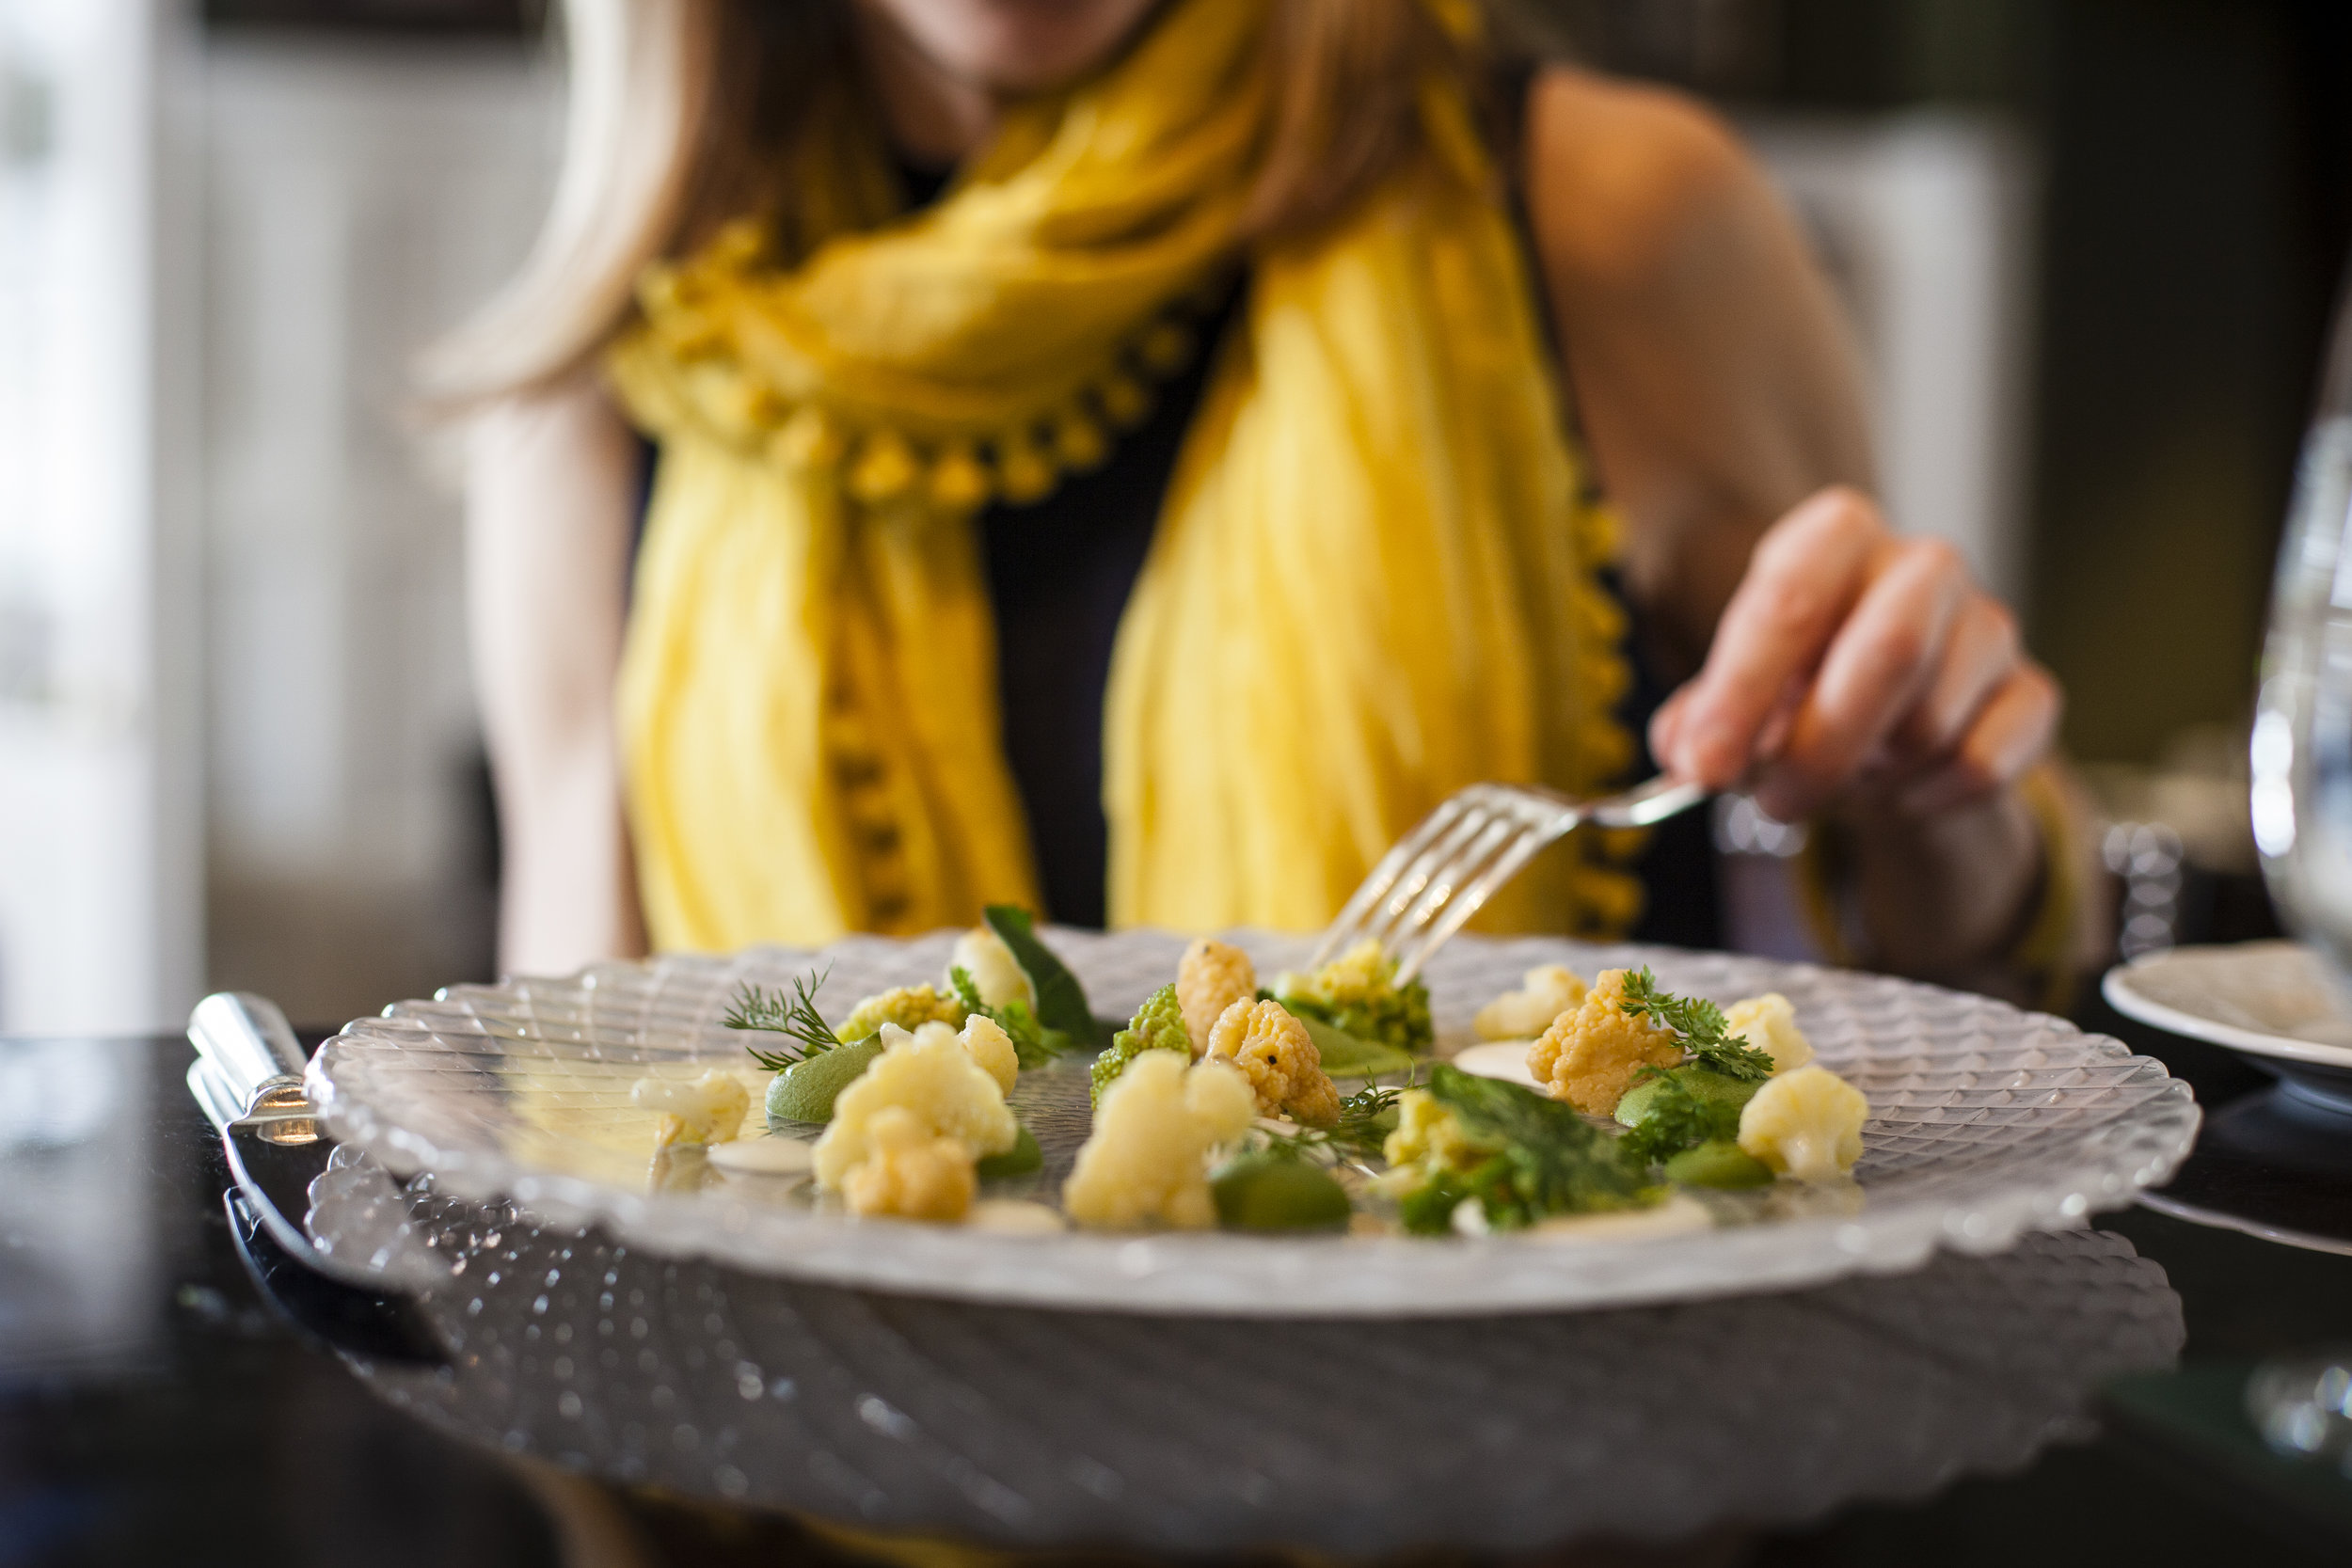 Trish Magwood's famous roasted cauliflower